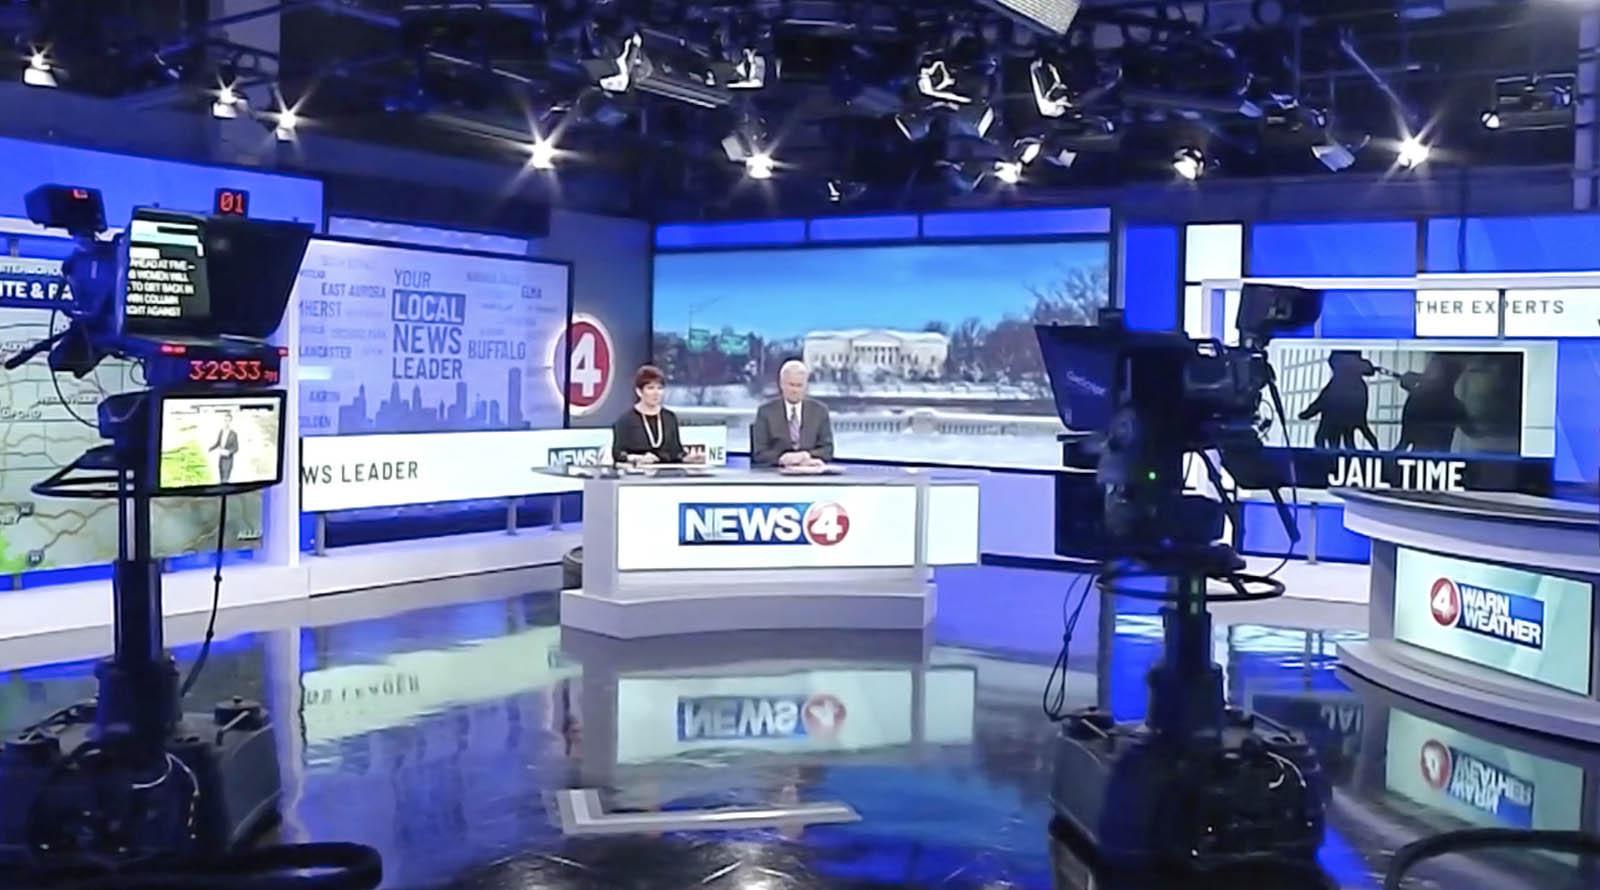 WIVB News Channel 4 Buffalo live streaming studio